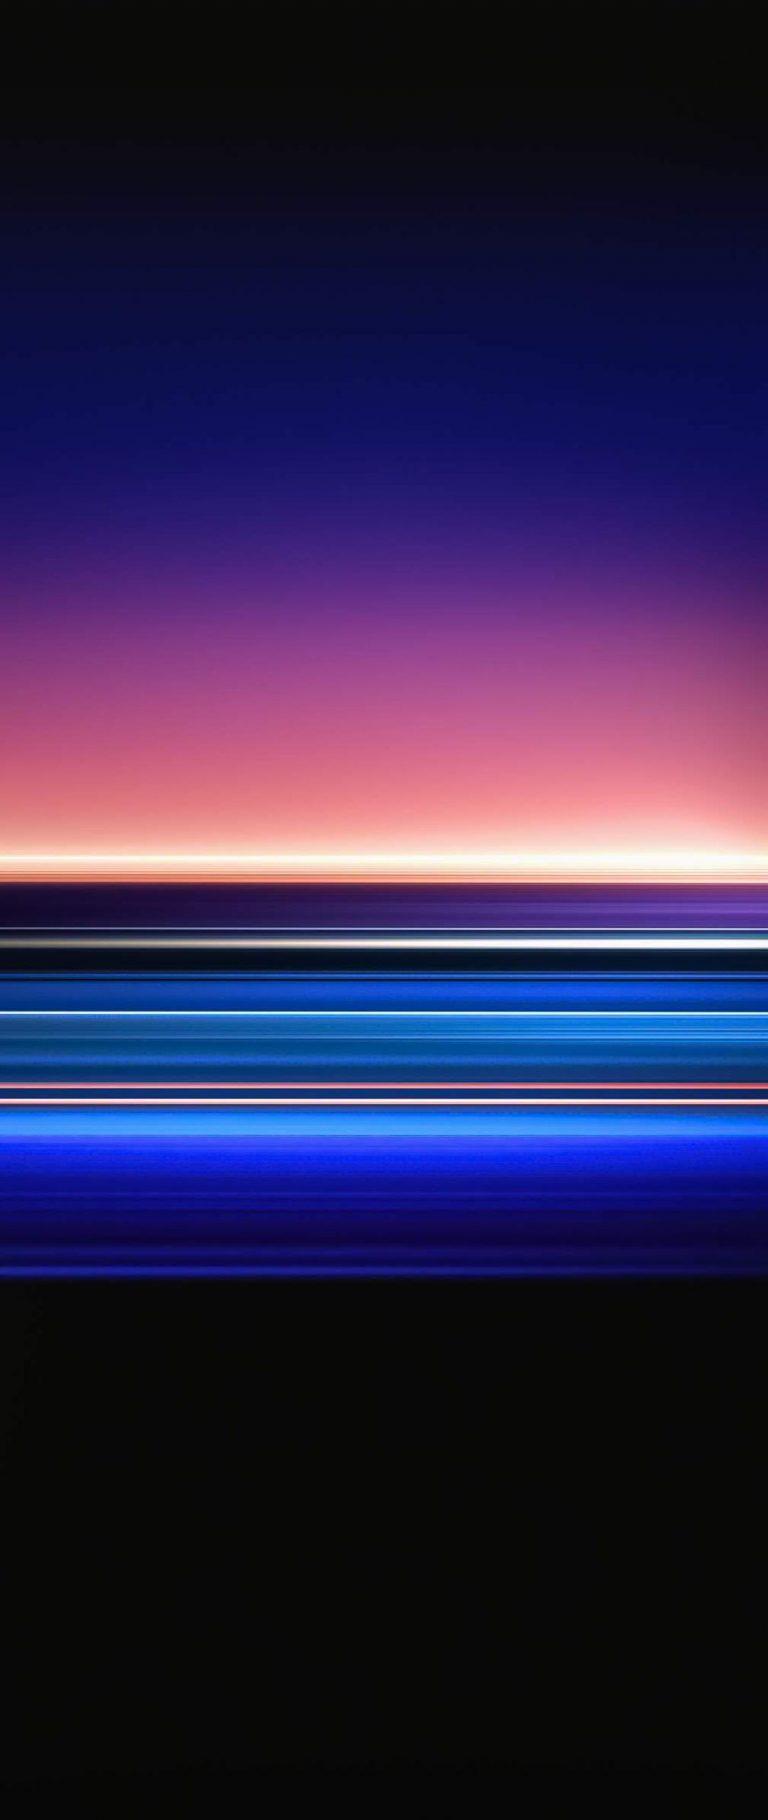 Sony Xperia 5 Stock Wallpaper 04 1080x2560 768x1820